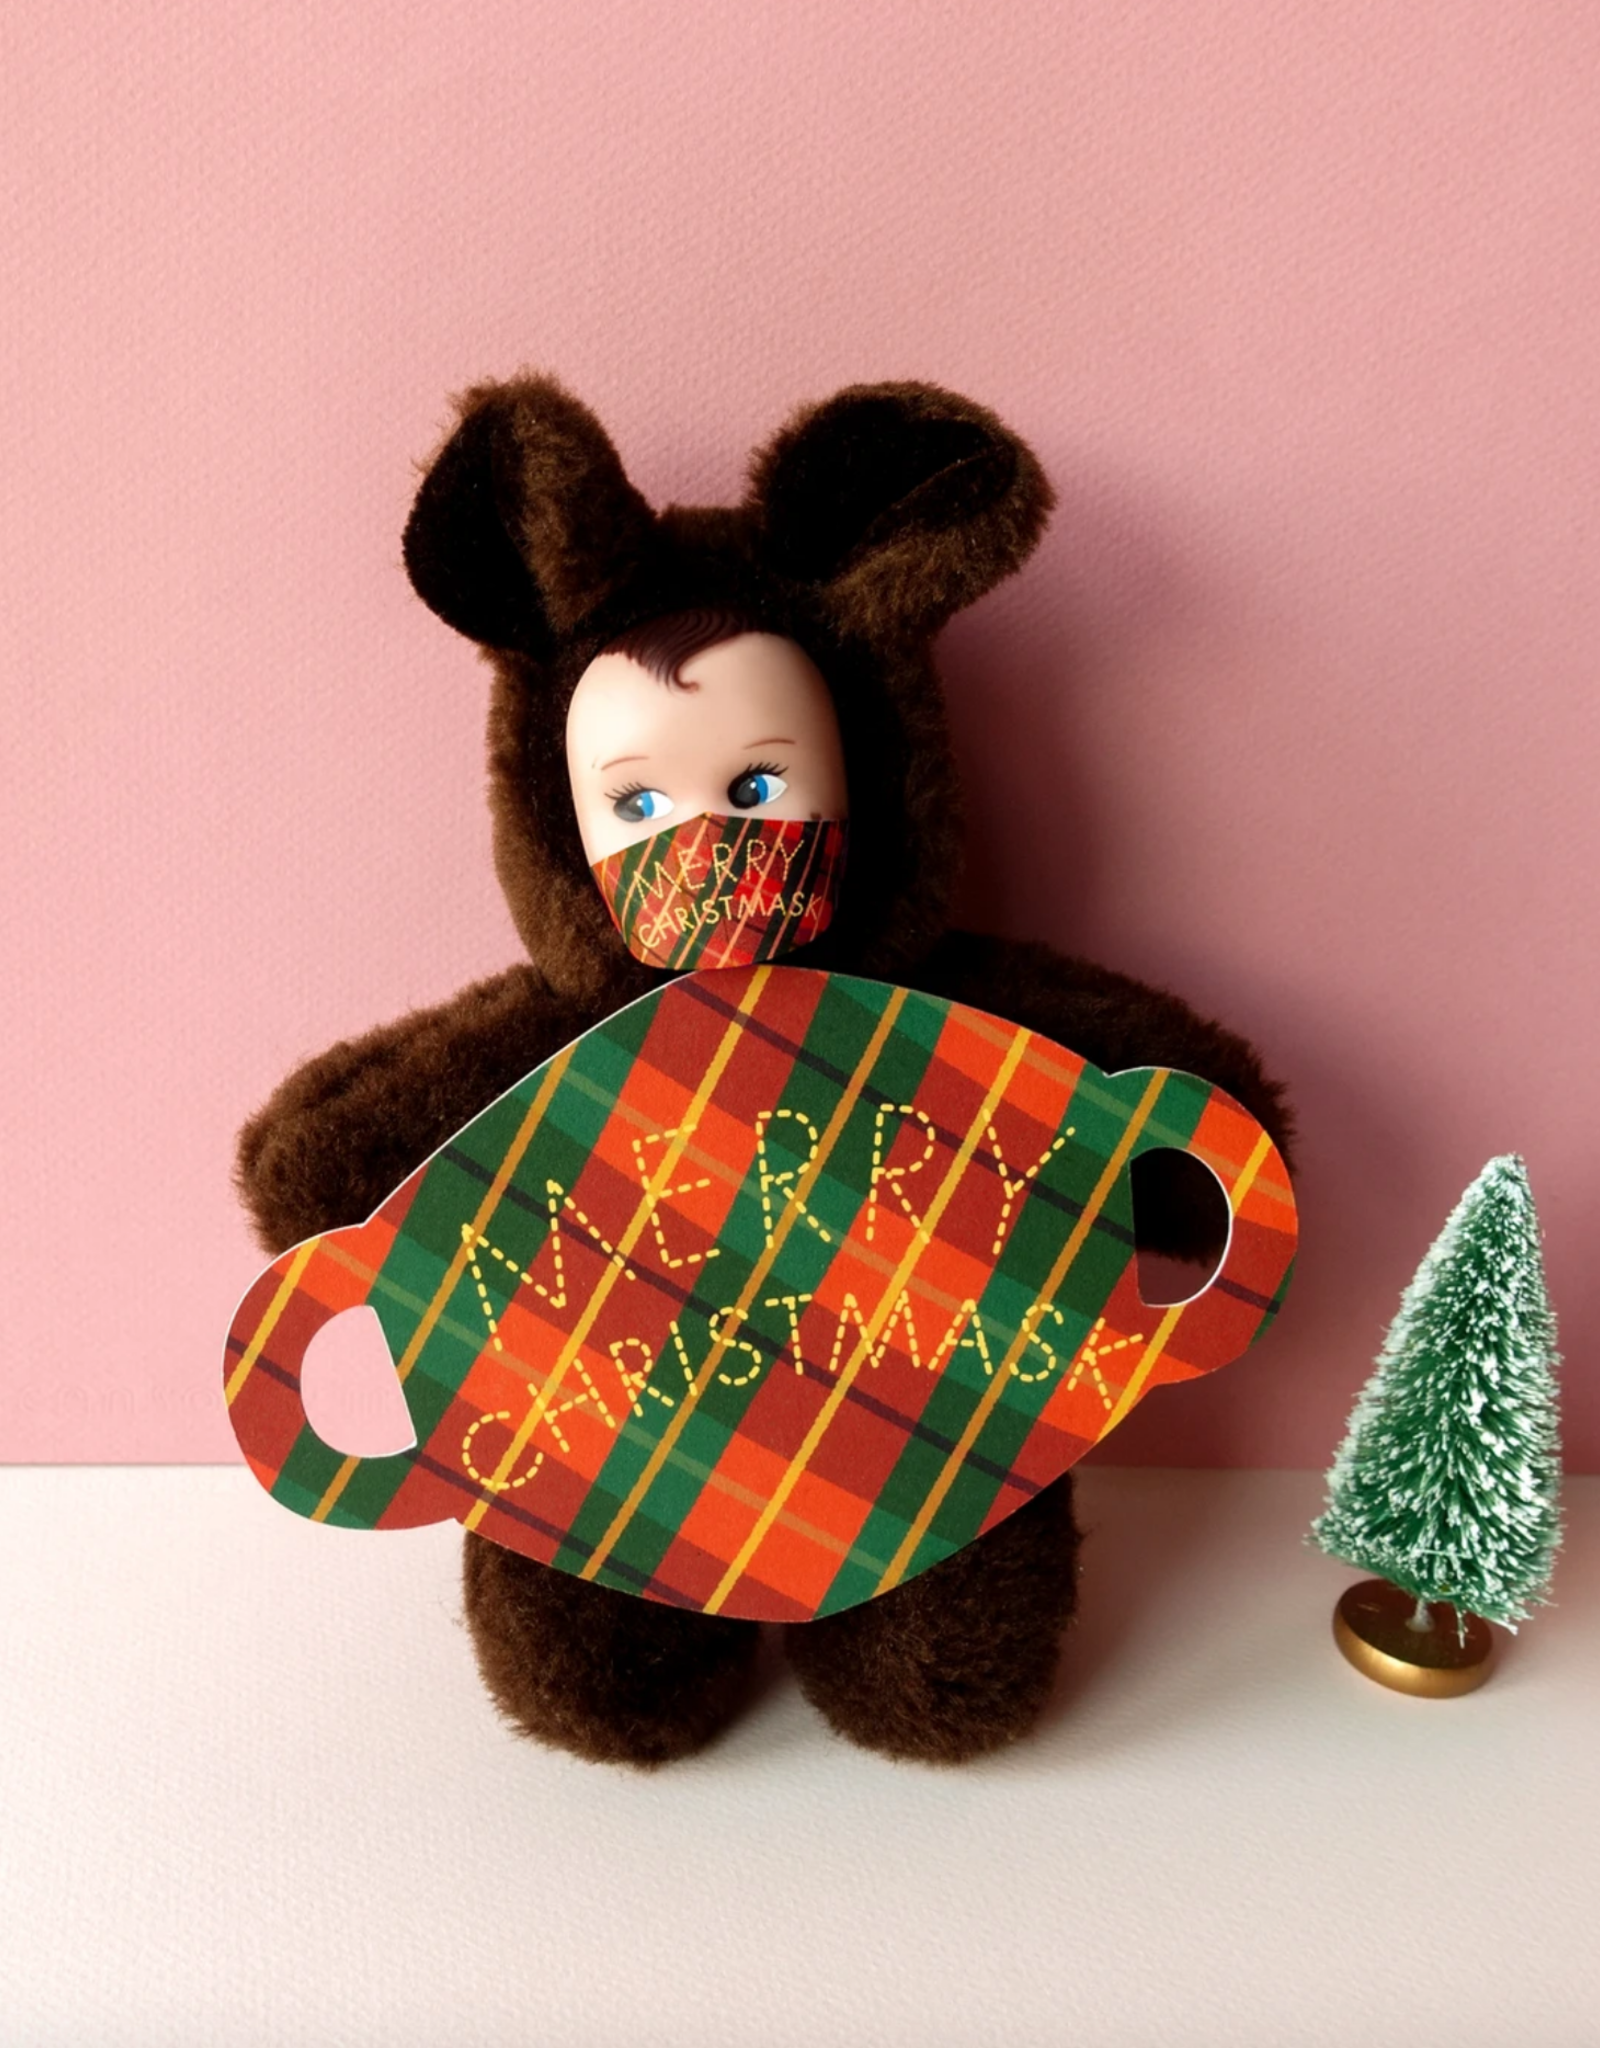 Merry Christmas Mask Die Cut Greeting Card